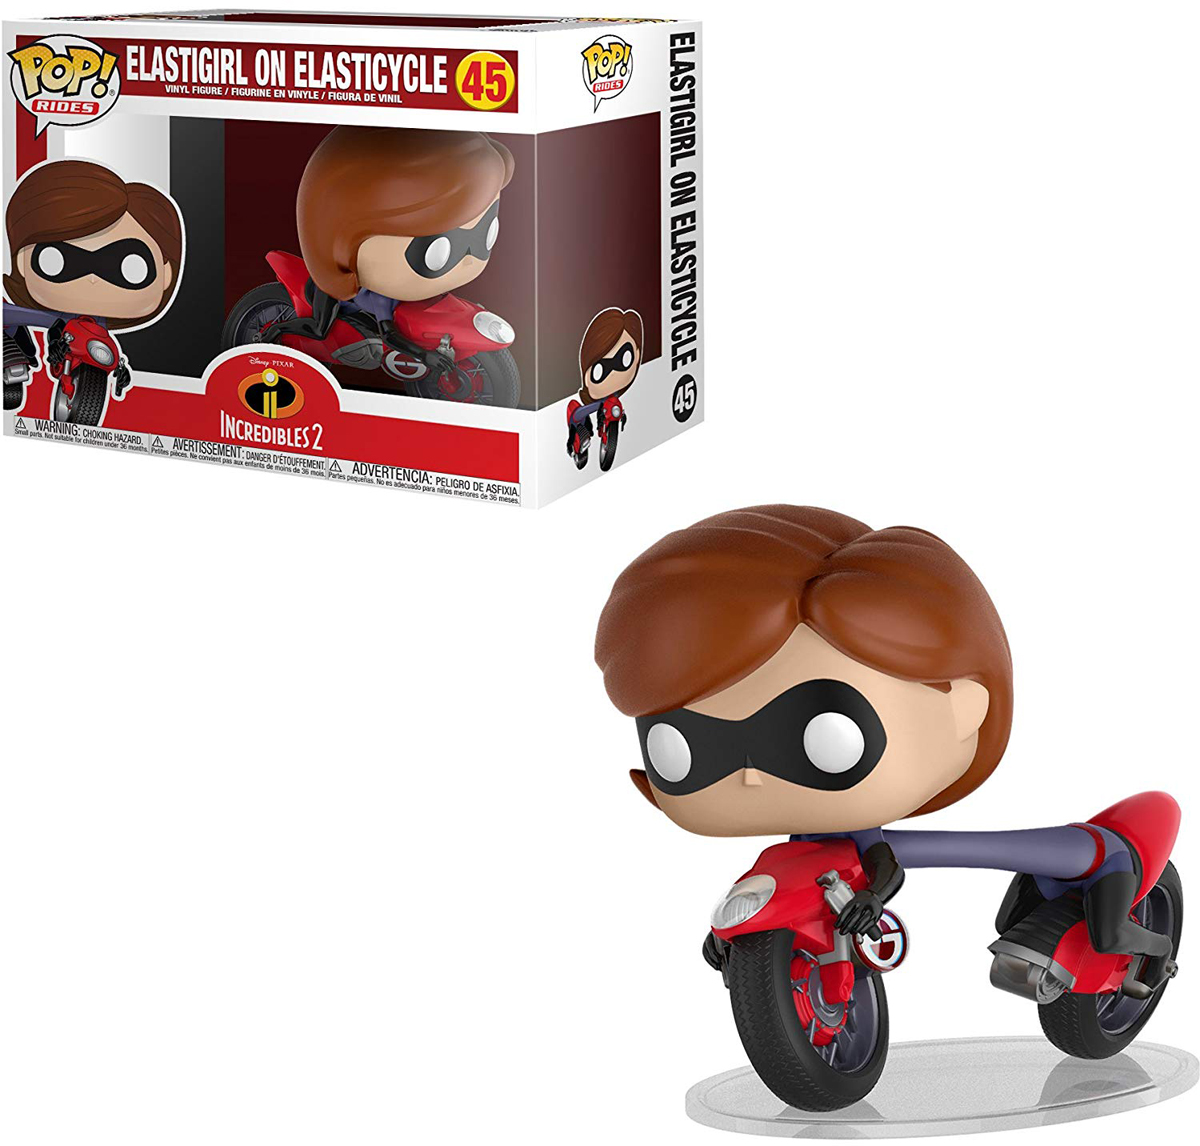 Funko POP! Rides Фигурка Суперсемейка 2 (Incredibles 2) POP Ride 1 29955 растение фикус эластика мелани д 12